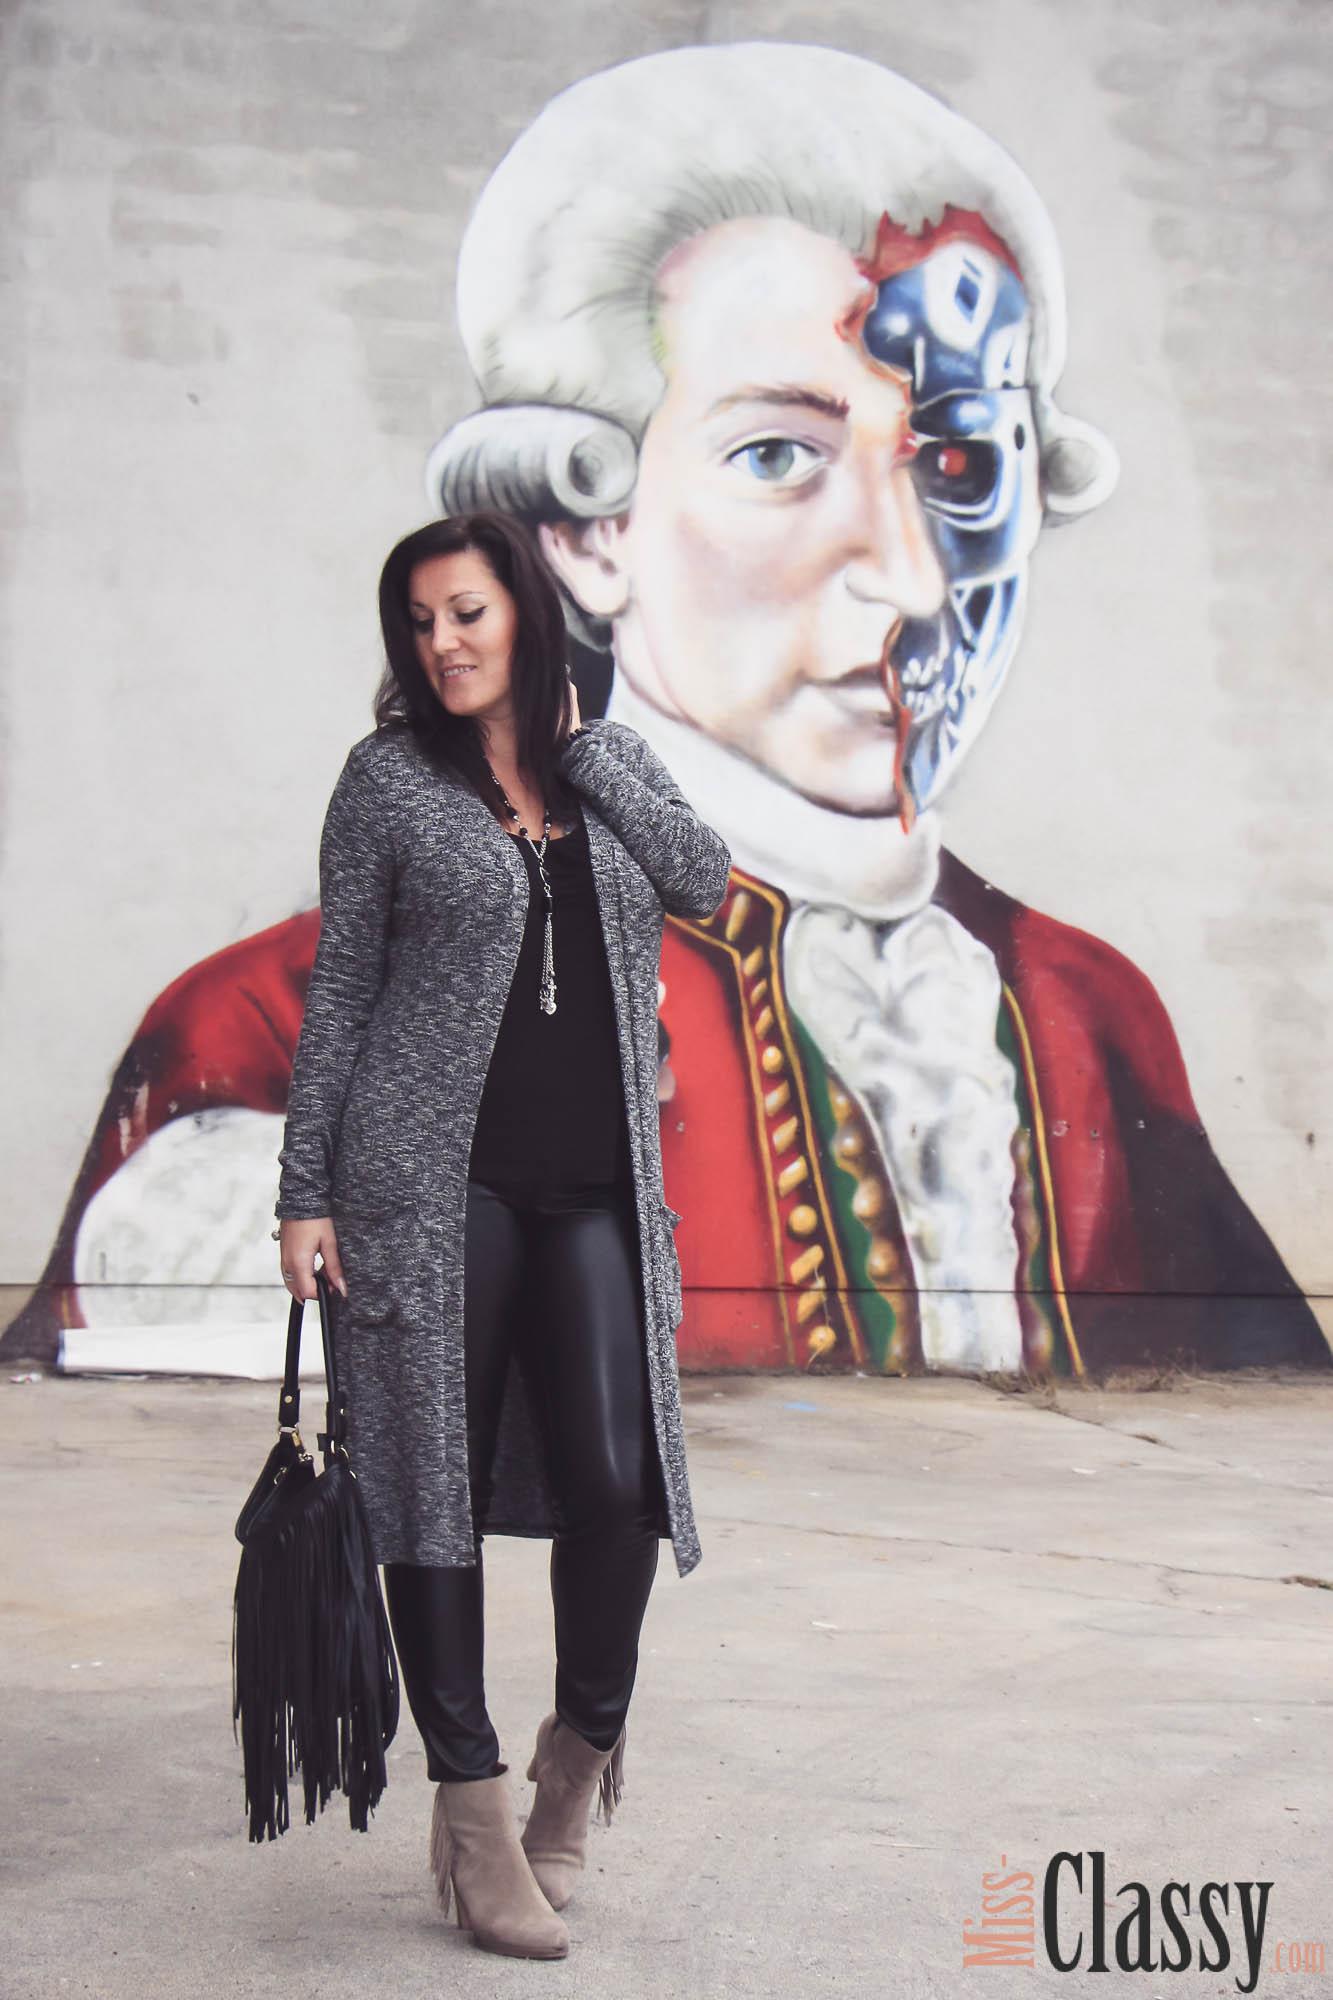 OUTFIT Schwarze Lederhose, grauer Longcardigan und beige Fransenboots - Fransentasche - Graz - Steiermark - Graffiti - Kunst - Art